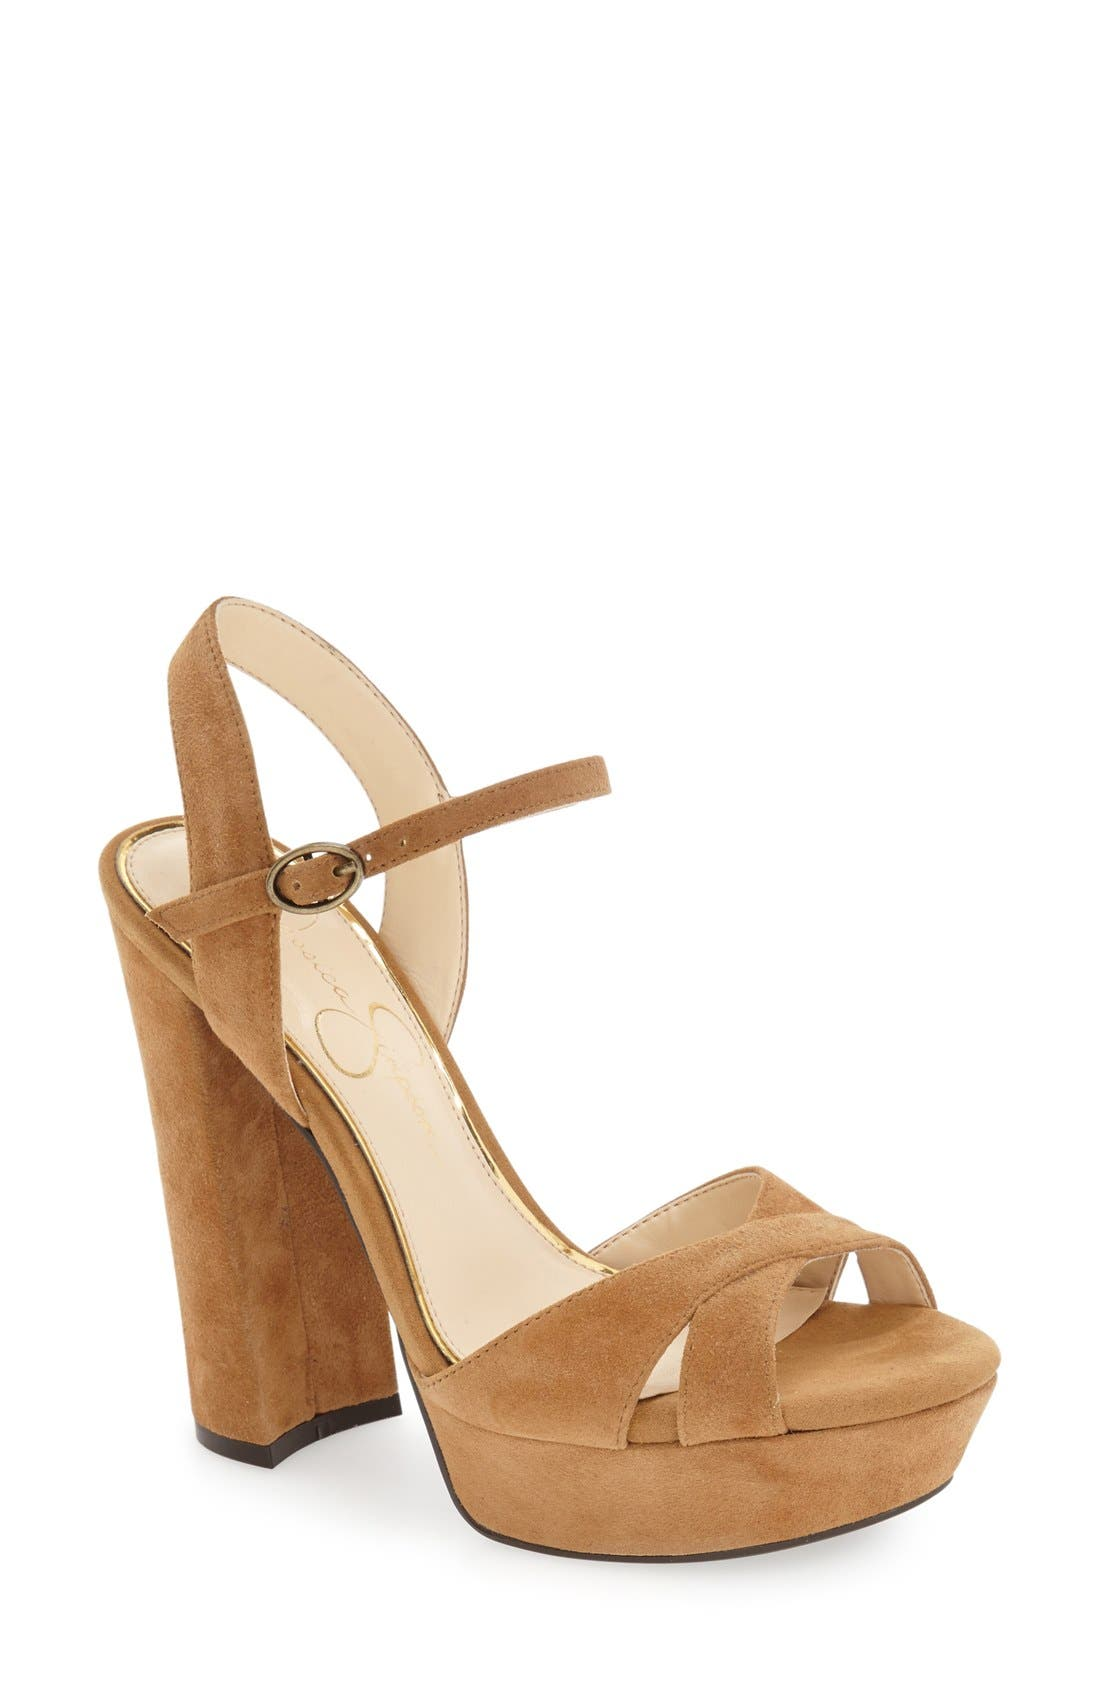 Main Image - Jessica Simpson 'Naidine' Platform Sandal (Women)